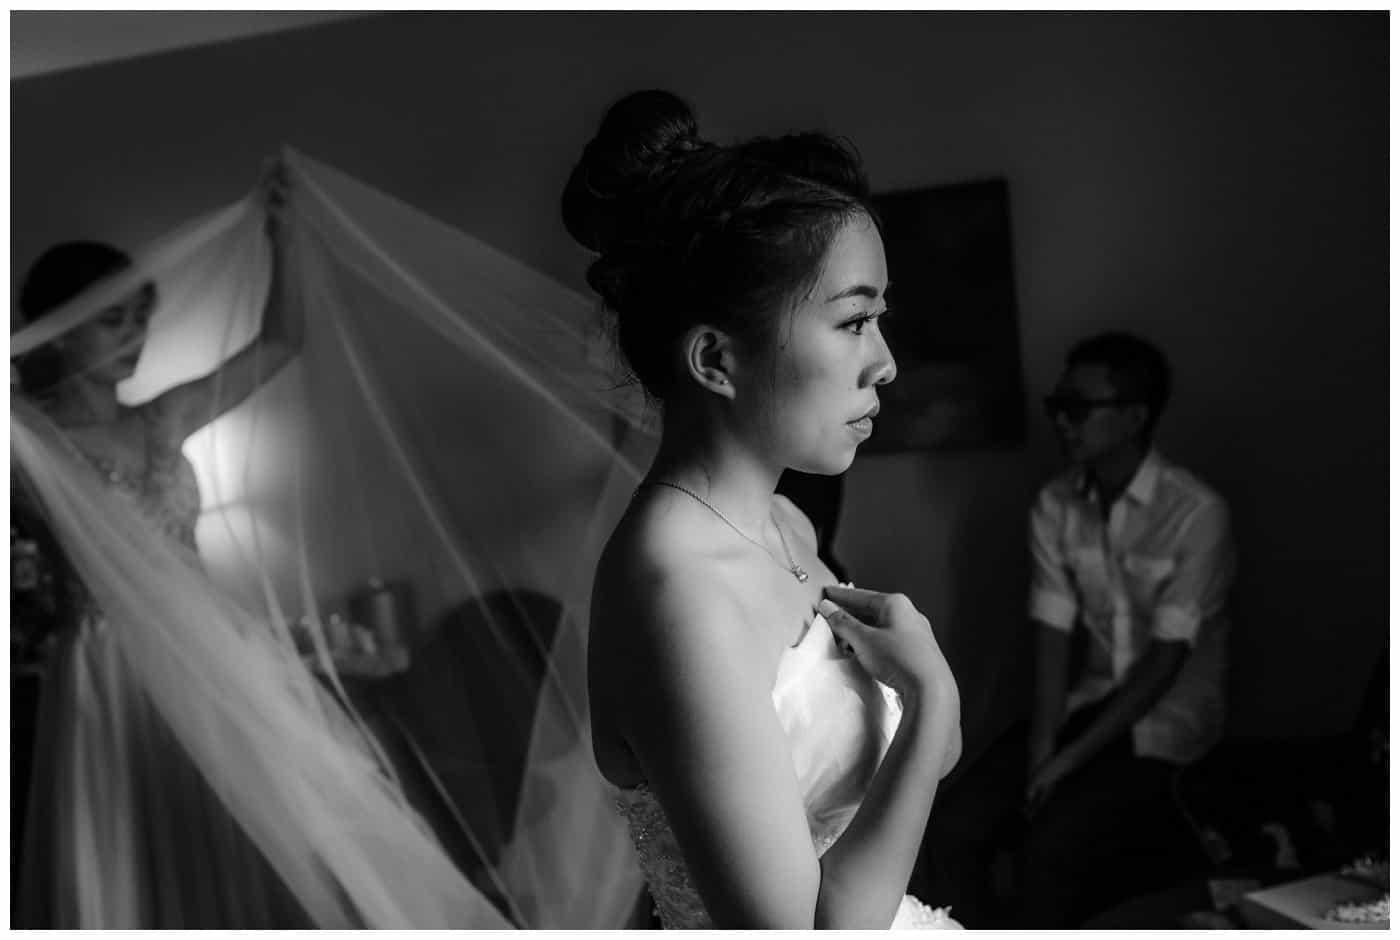 Cabane à sucre Constantin wedding photography